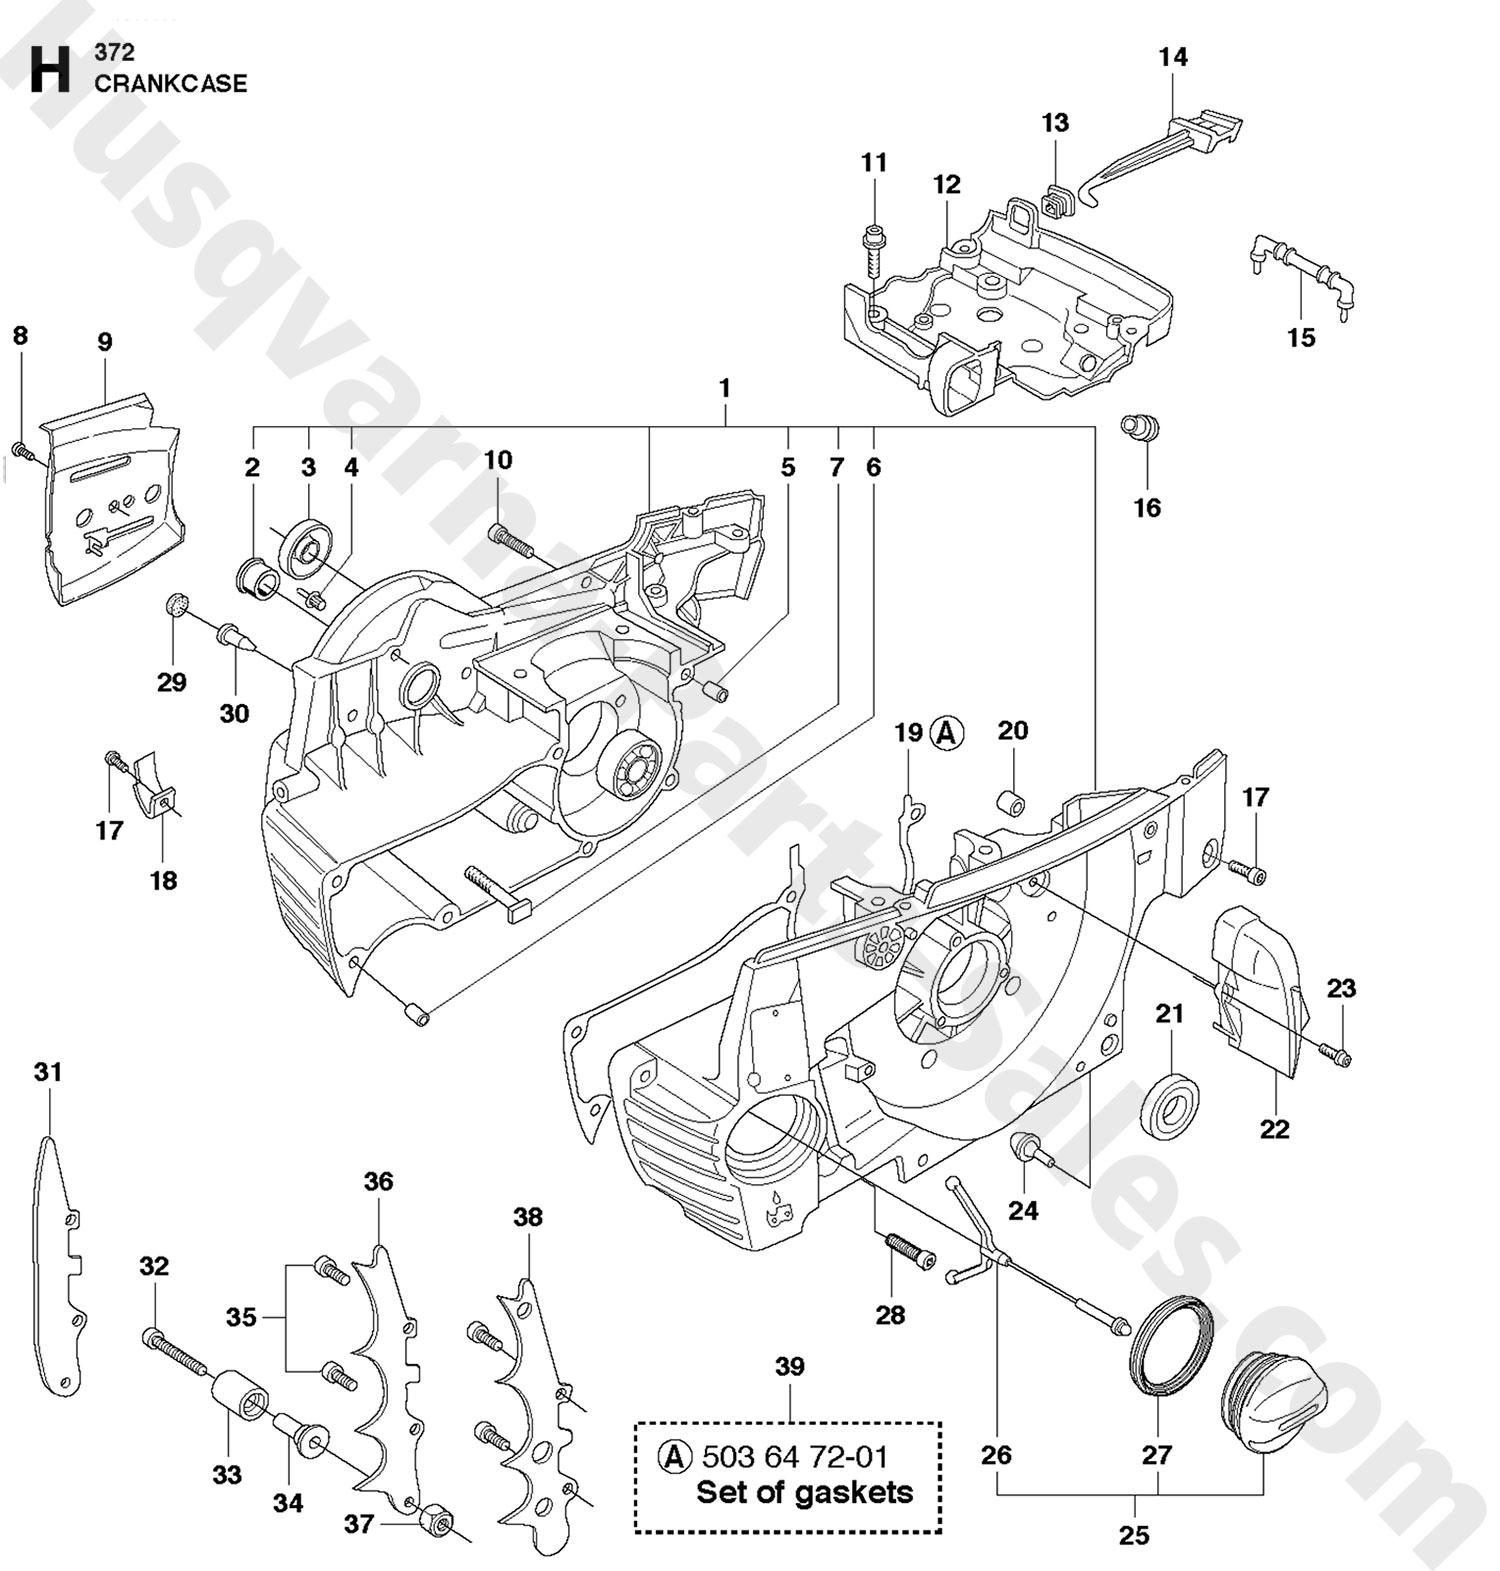 A02003 further Wiring Diagram Amen Frame further Viper 3000 Alarm Wiring Diagram also Deutz Allis D5206 Tractor Wiring Diagram Service Manual Htde Swiring additionally Komatsu Forklift Wiring Diagrams. on home schematics